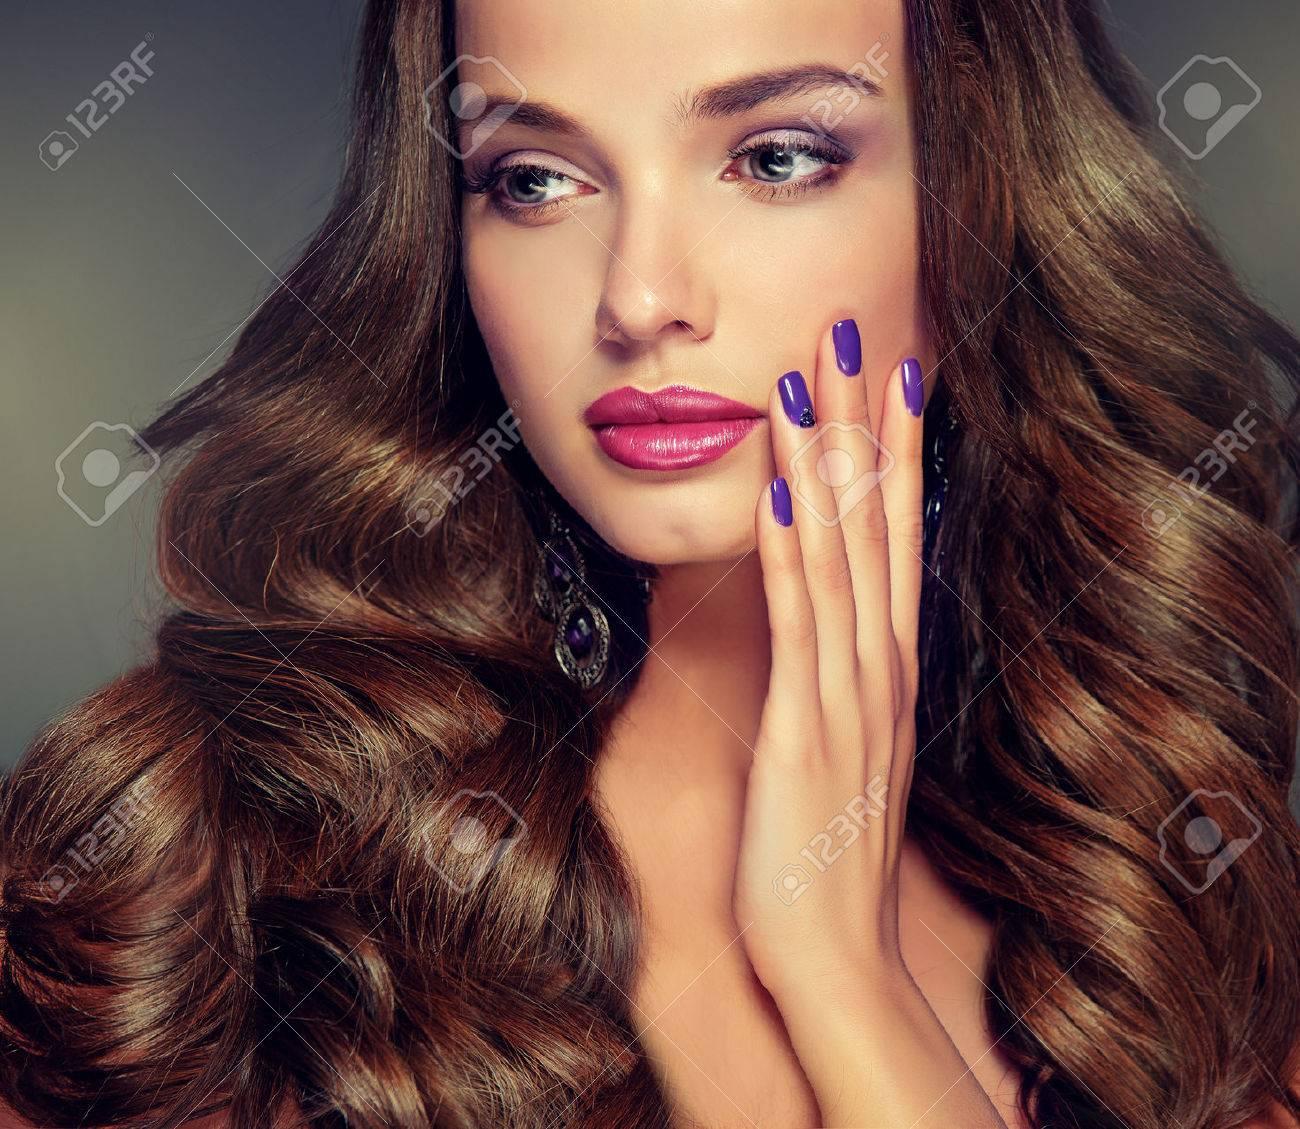 modelo de niza chica joven con densa pelo rizado brillante moda maquillaje y peinados